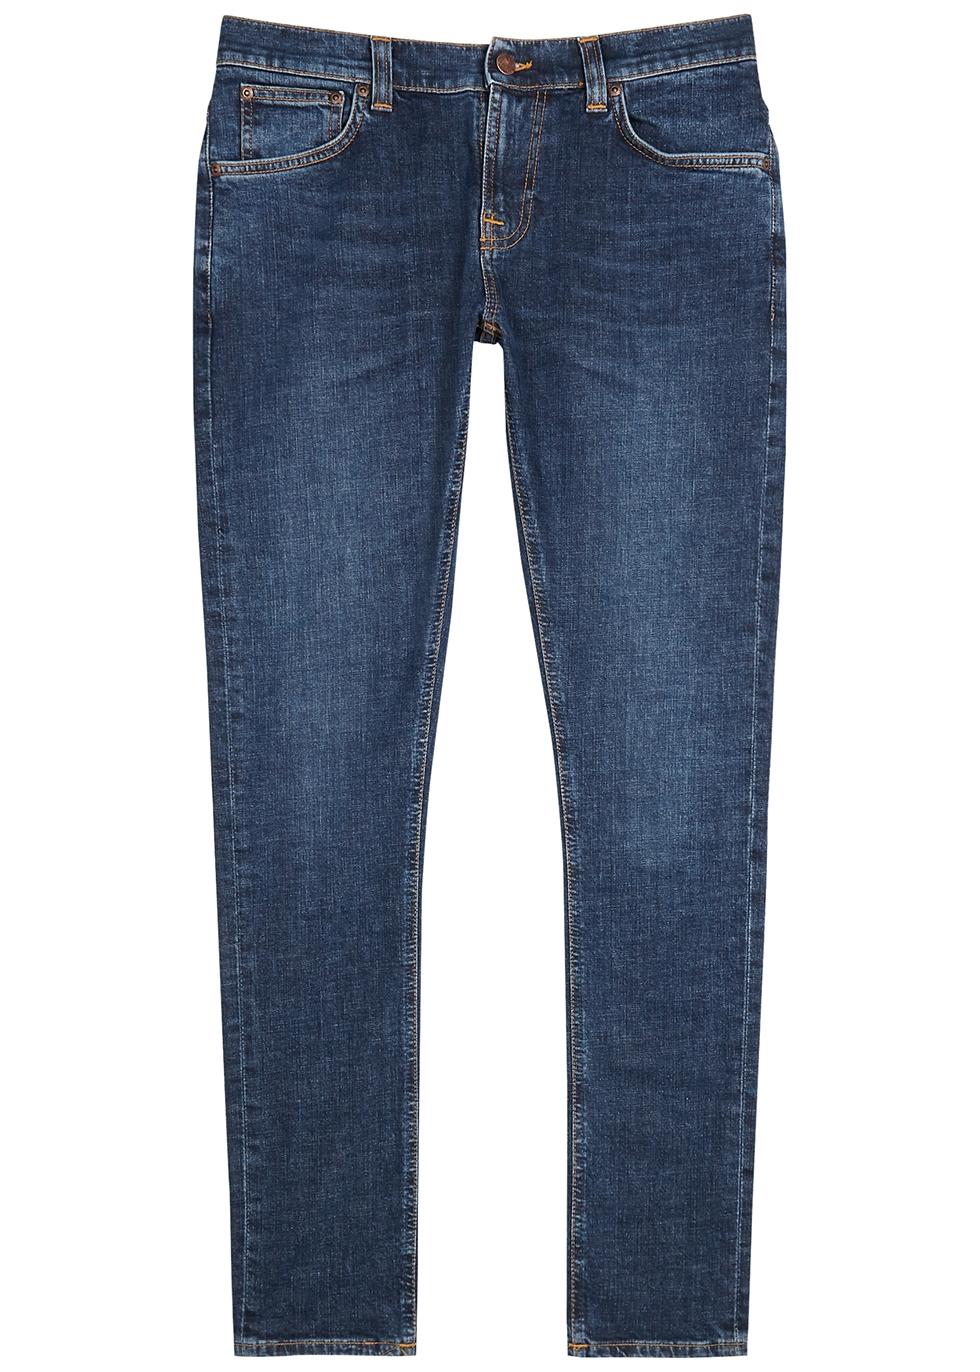 Tight Terry dark blue skinny jeans